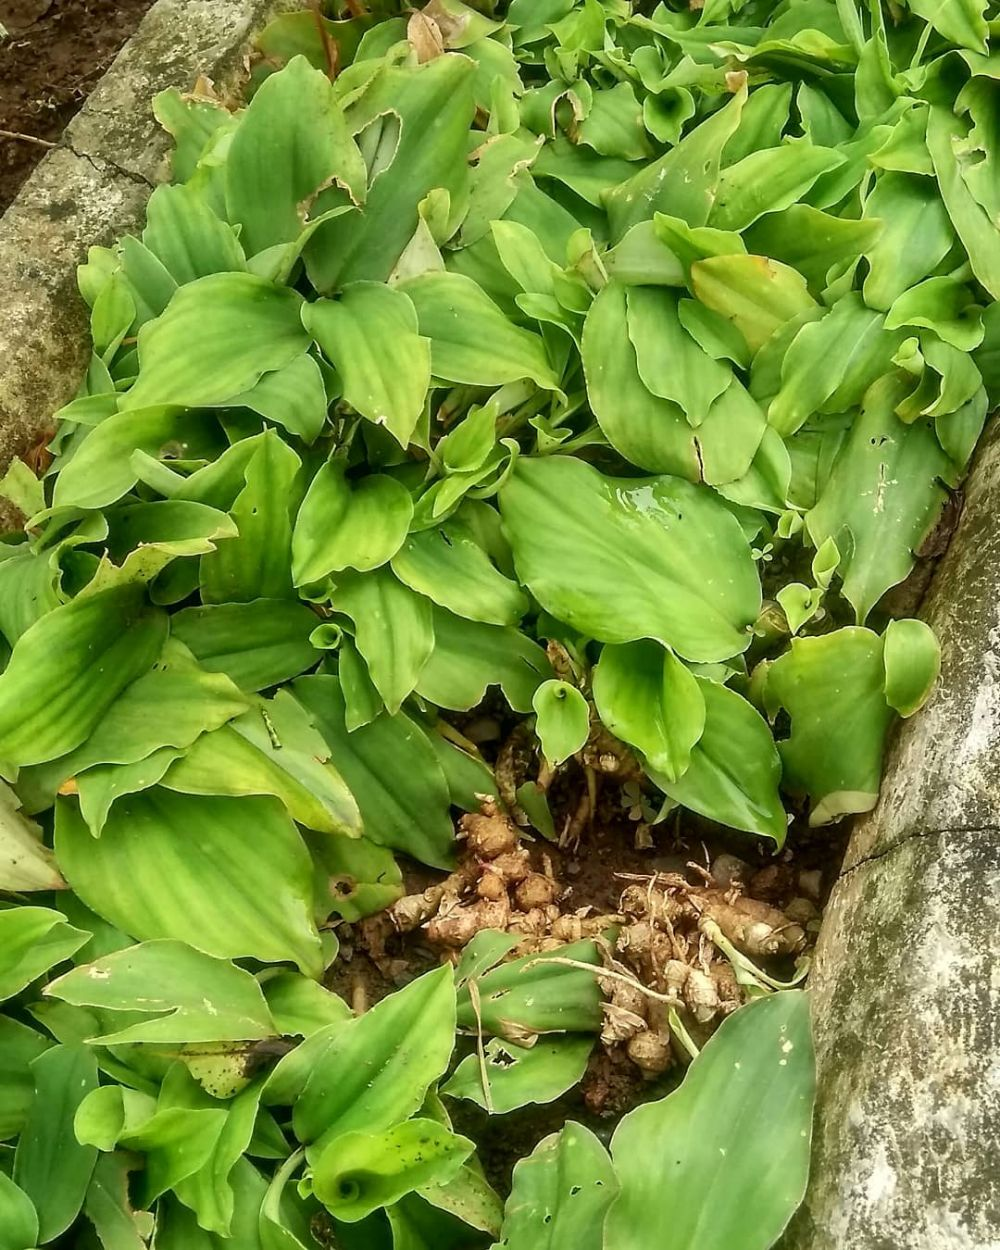 Jenis tanaman obat jenis Freepik, Instagram © 2021 brilio.net